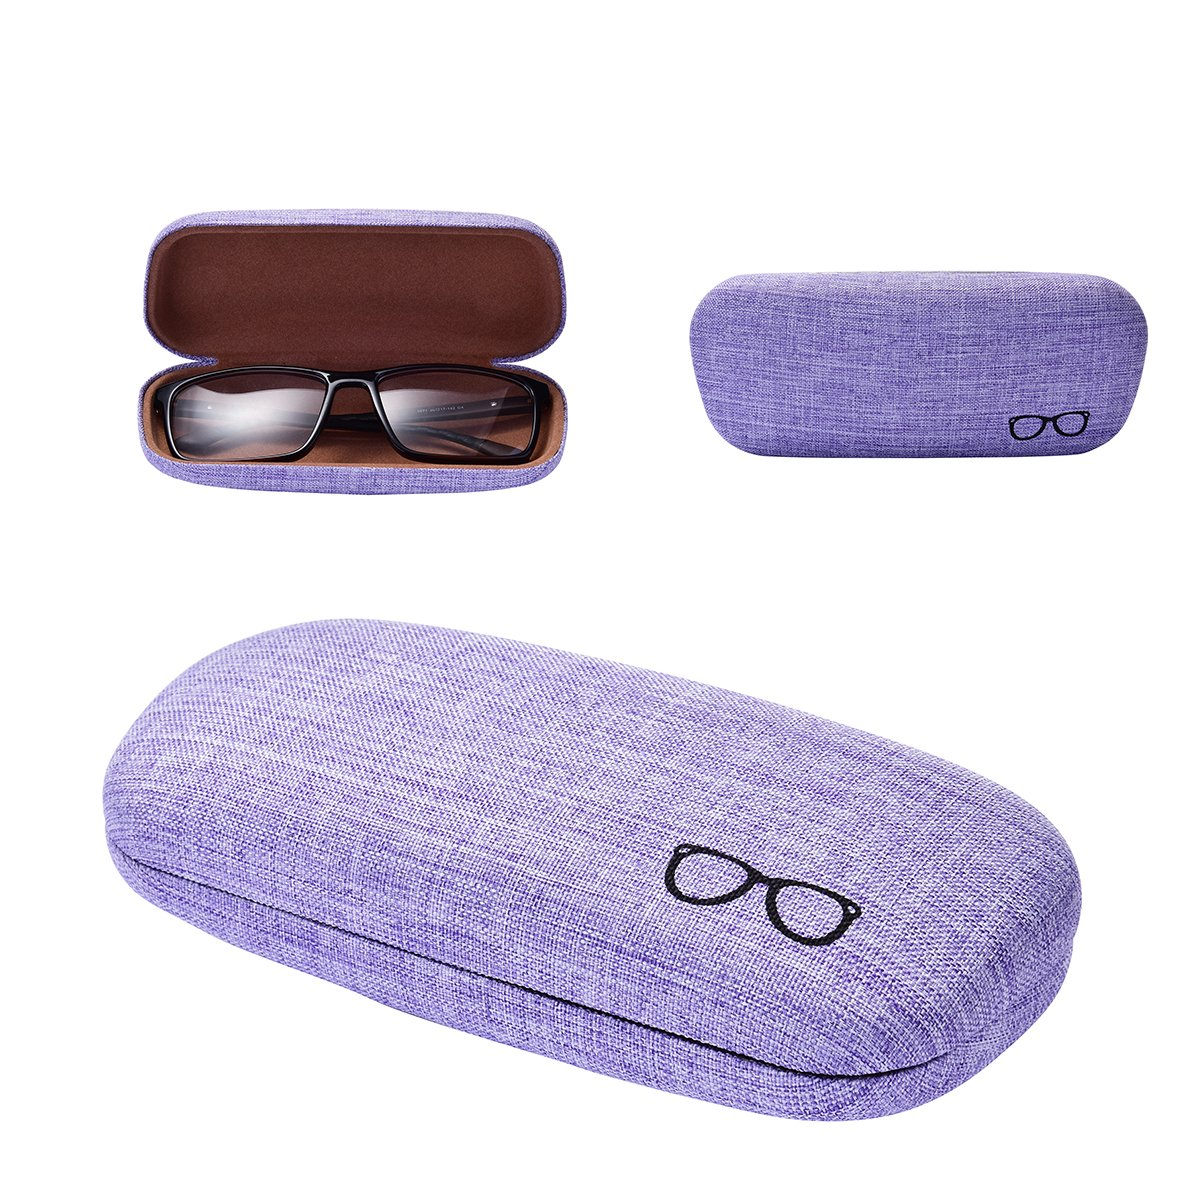 Philley Linen Fabrics Ultra-Light Hard Myopia Eyeglasses Glasses Case